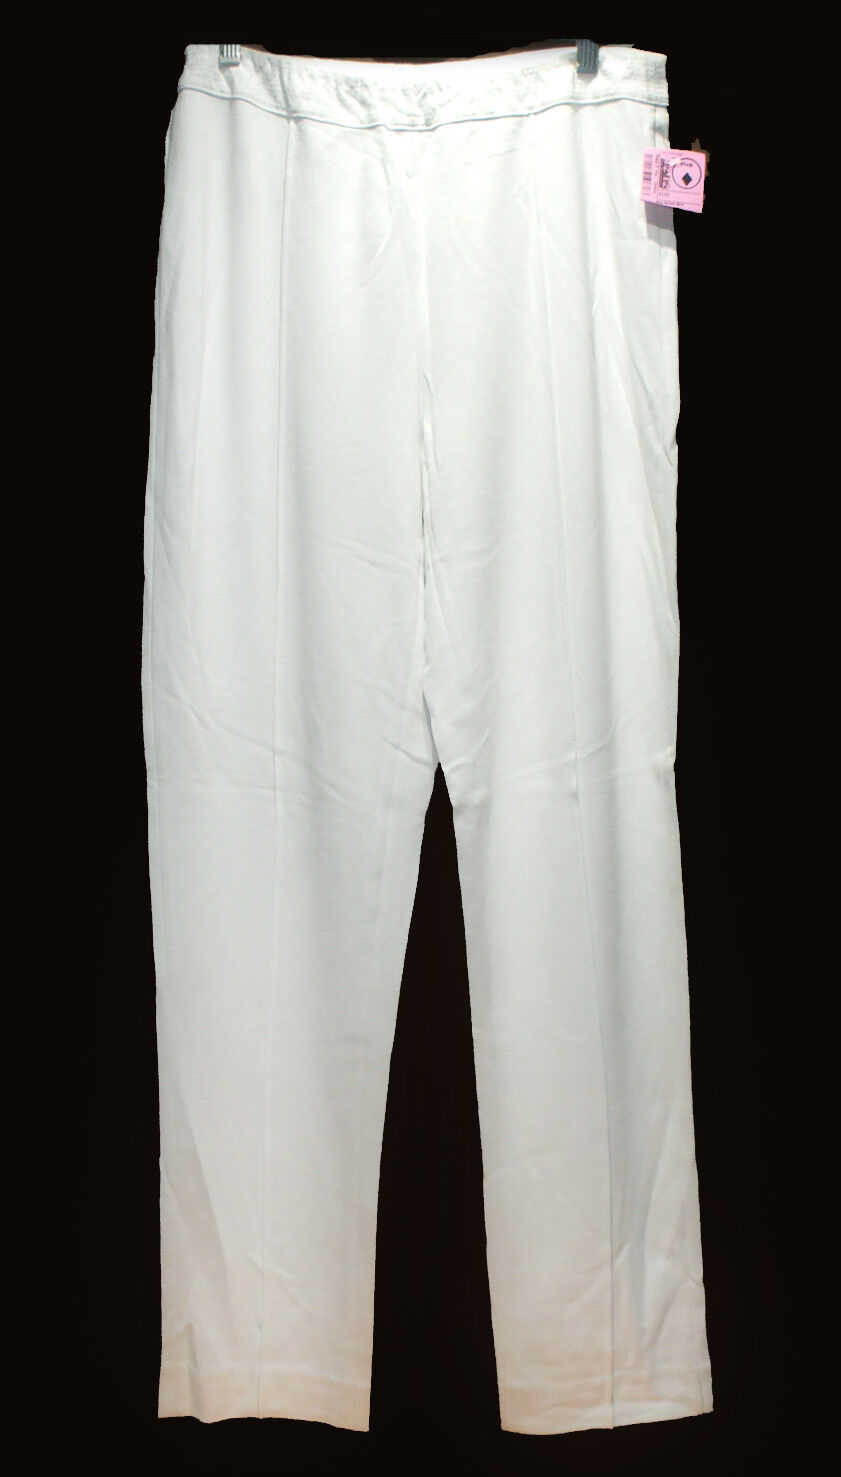 NEW Soft Surroundings WHITE Stretch Knit Slim Pants sz M Pull-On